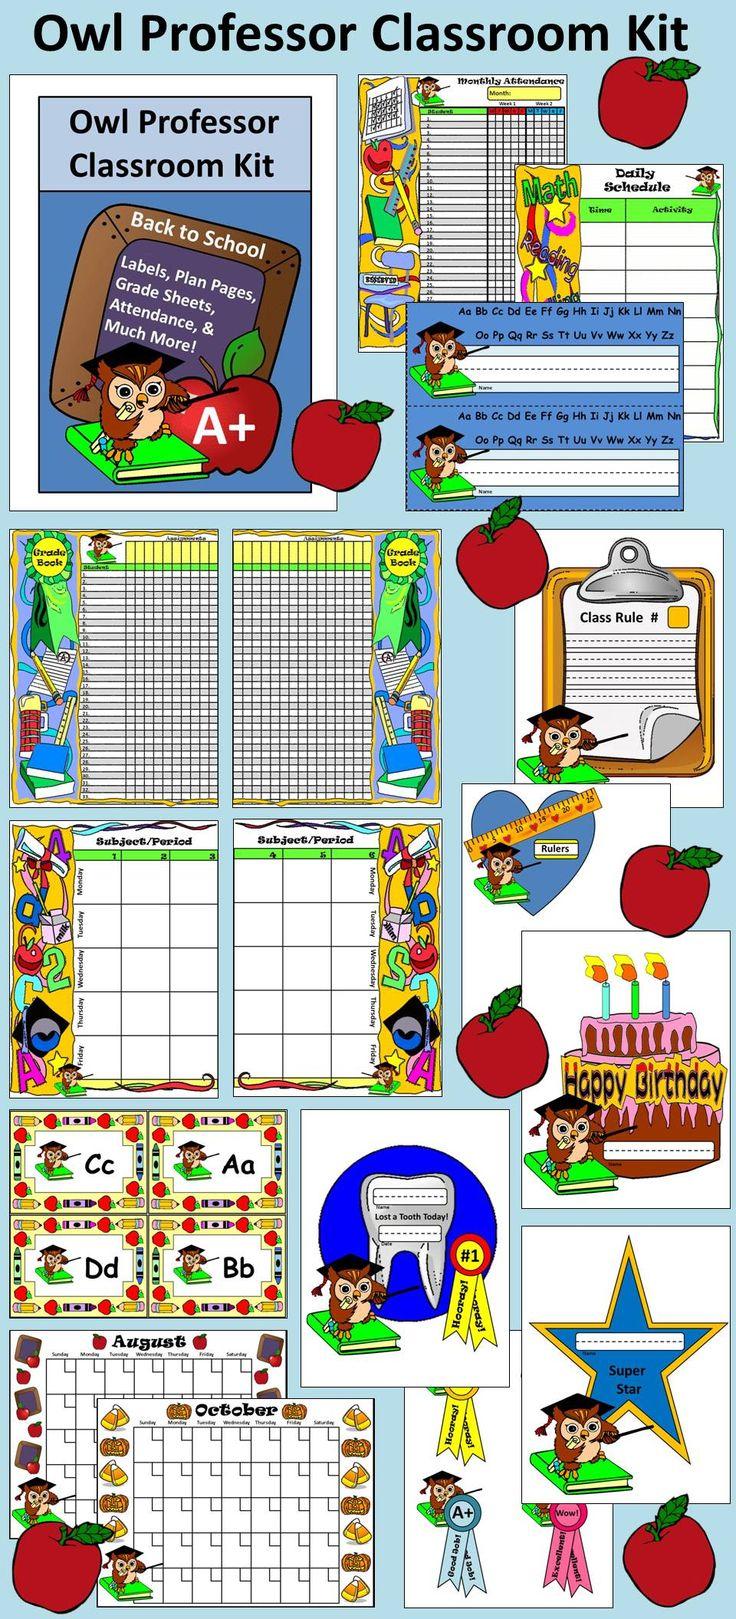 Classroom Design Kit ~ Best ideas about attendance sheets on pinterest